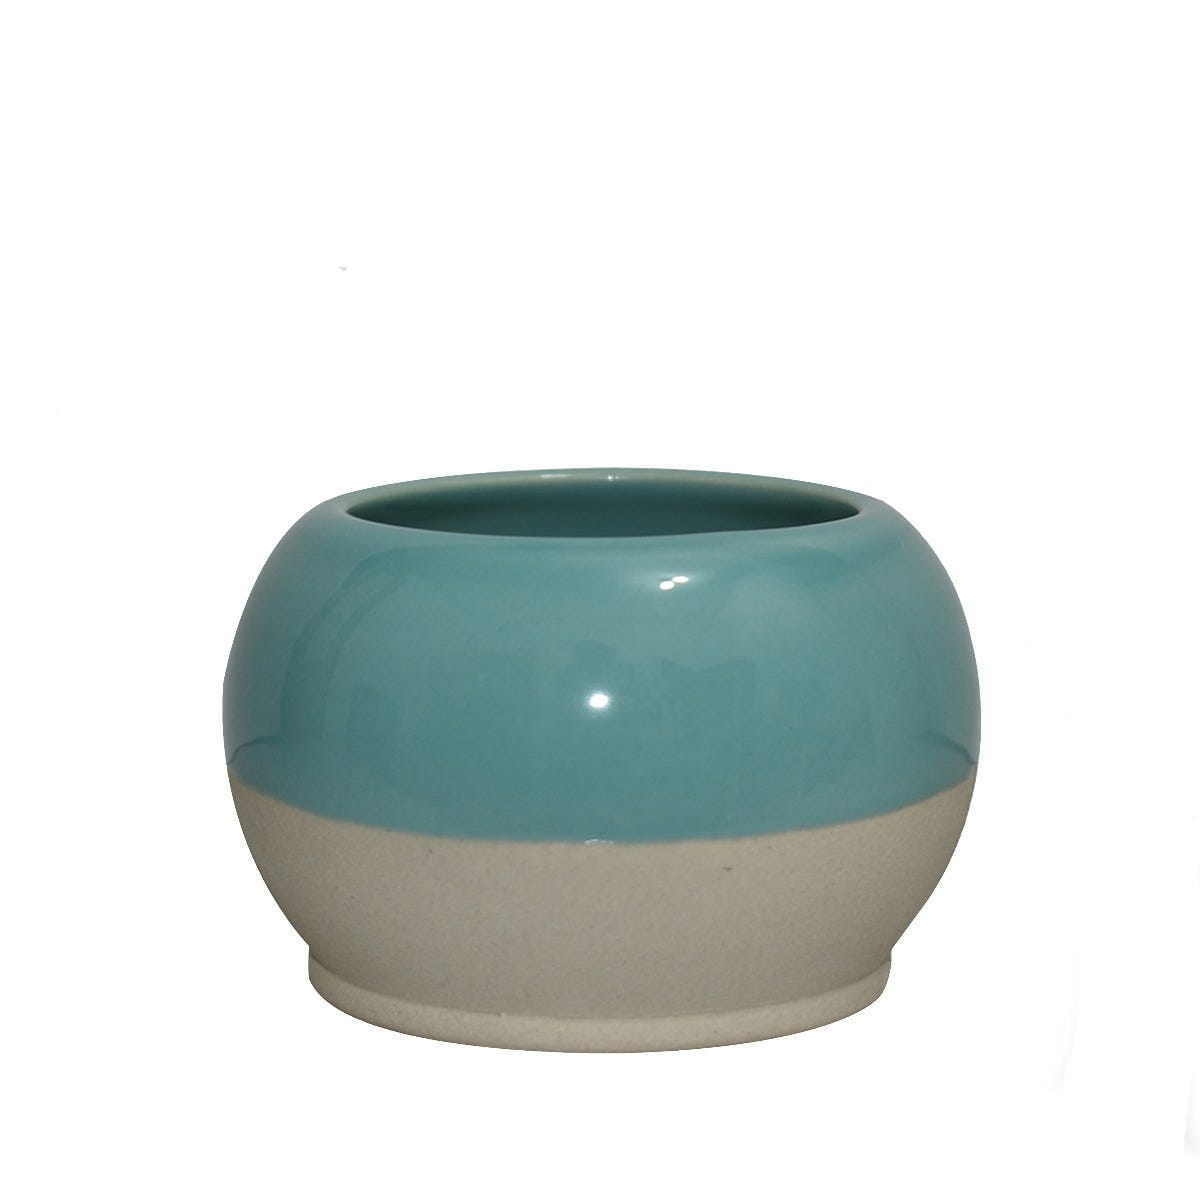 Maceta chica de cerámica Casa Mejicu® redonda color gris y azul